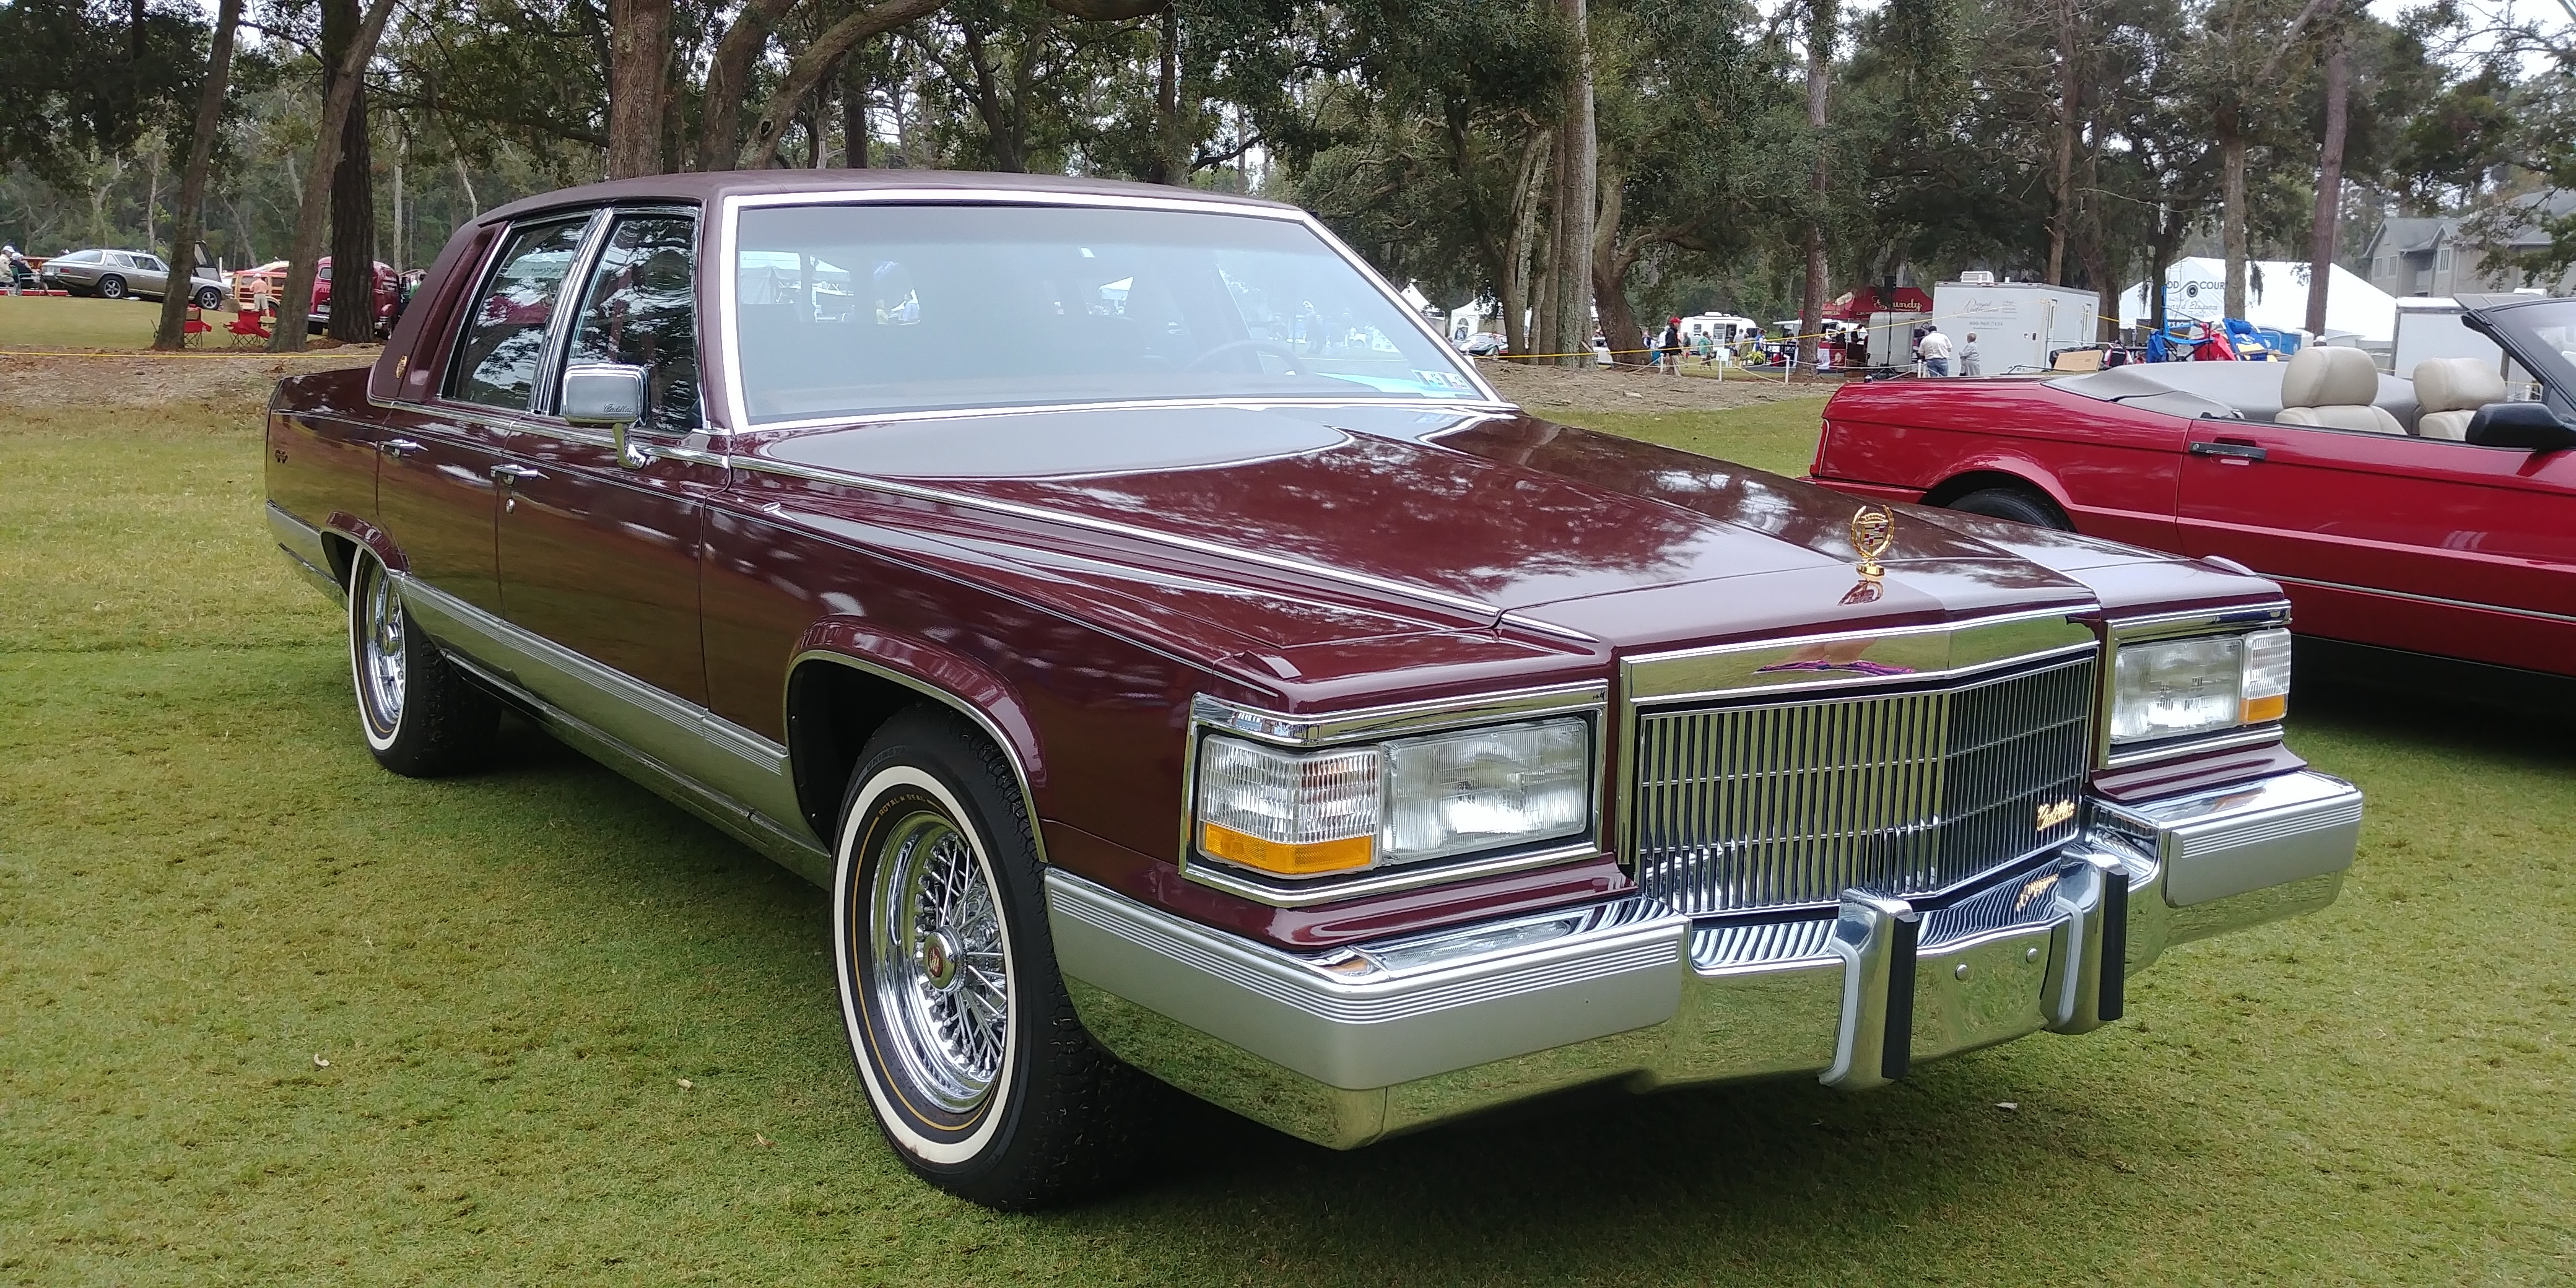 Hilton Head shows off a fine cache of Cadillacs ...